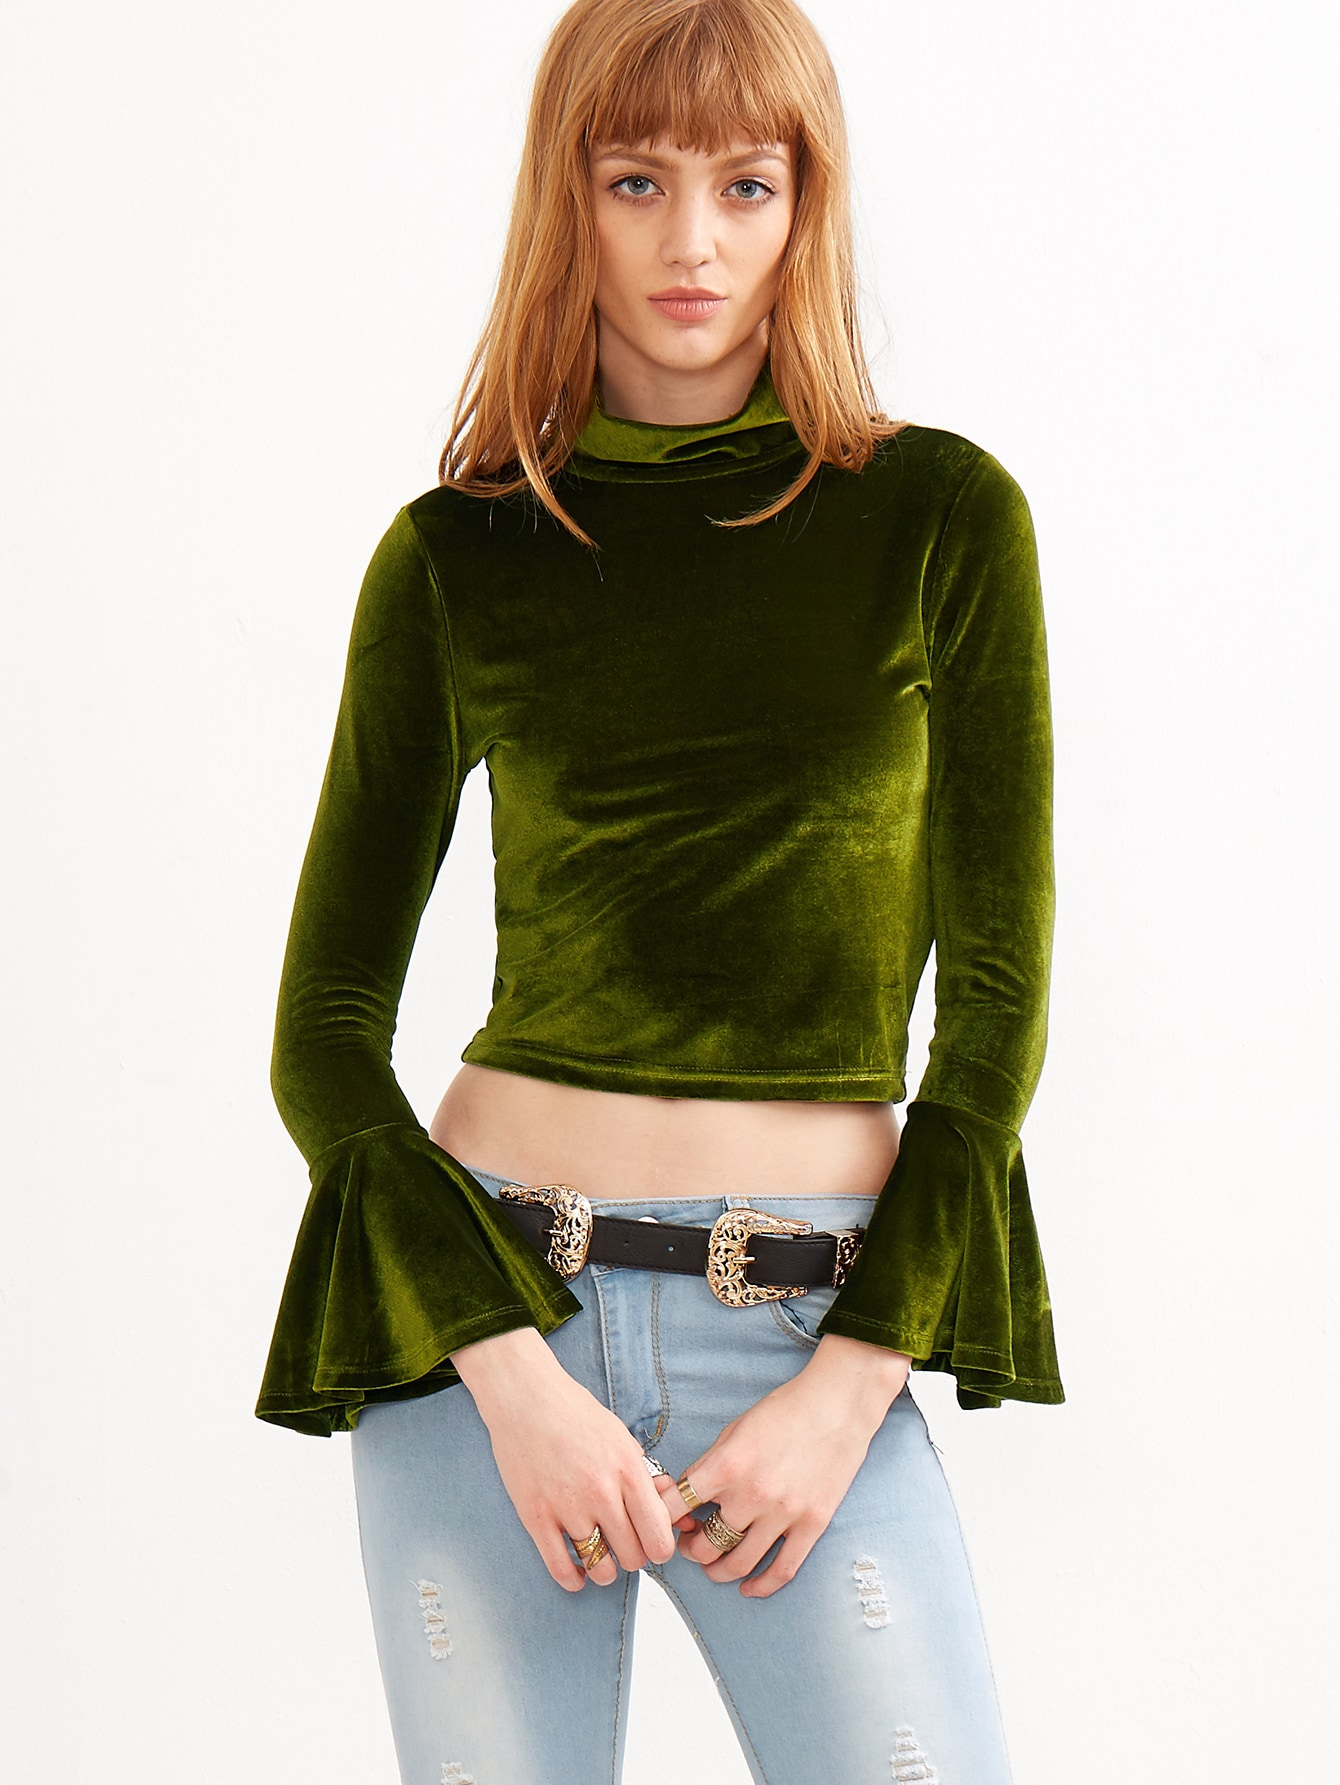 blouse160921502_2